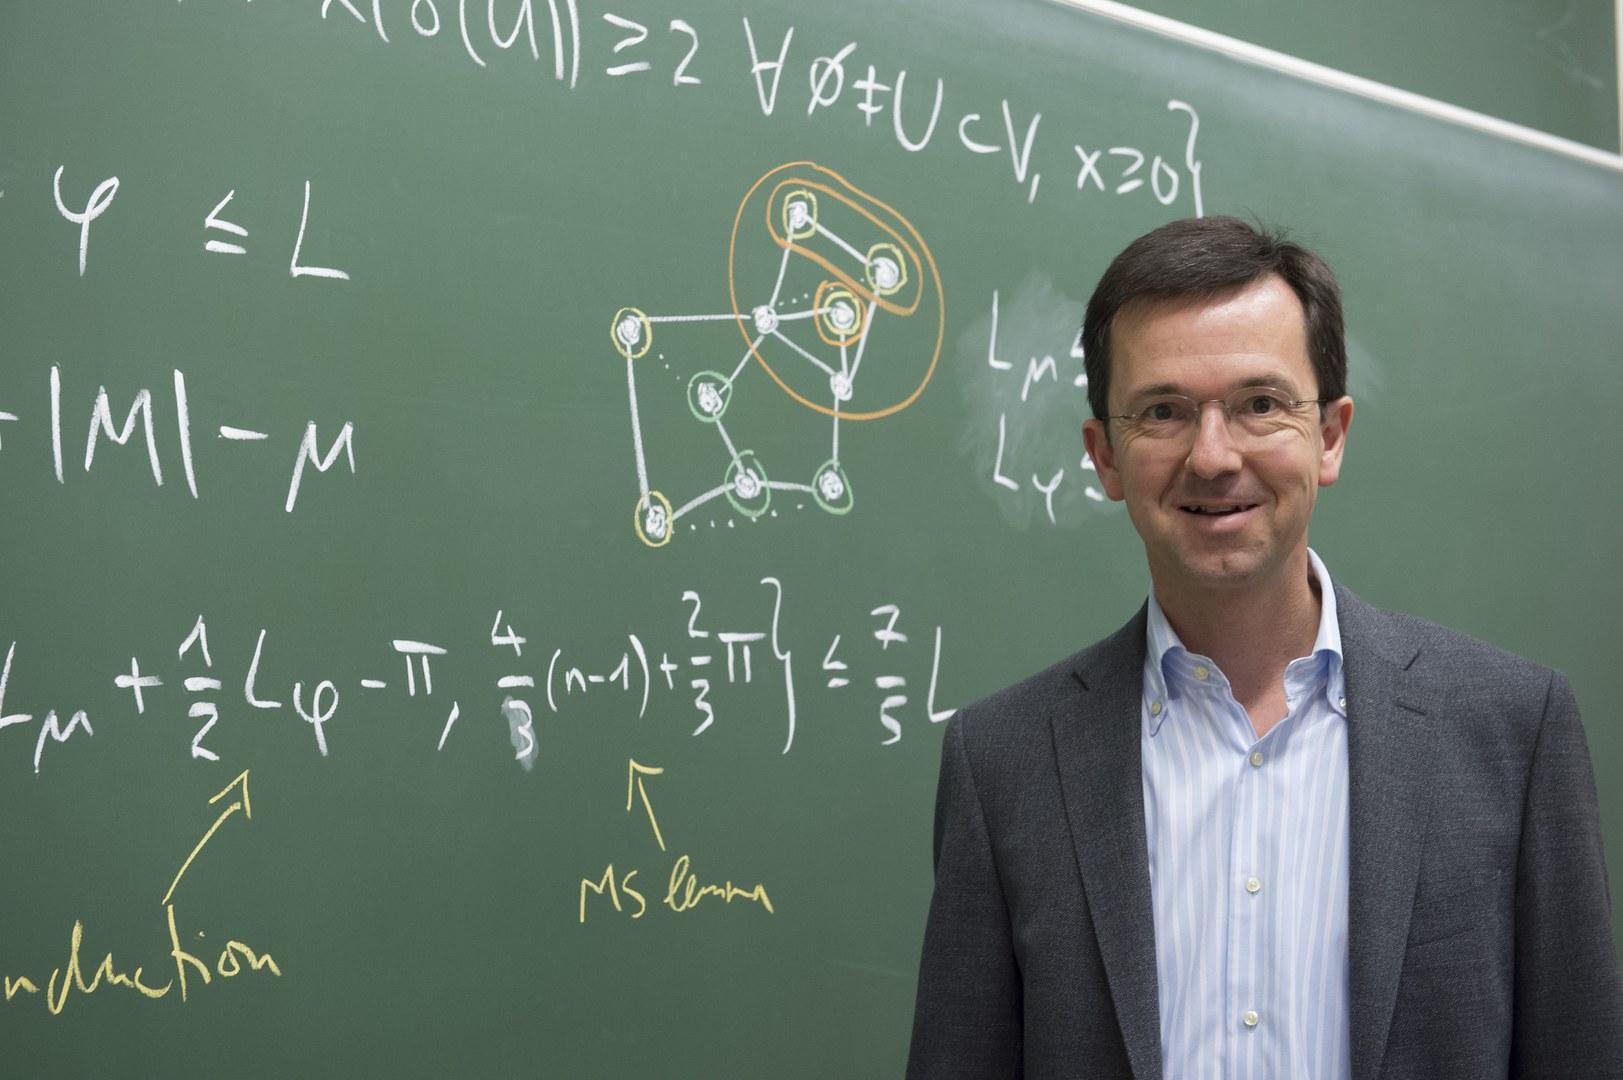 Prof. Dr. Jens Vygen